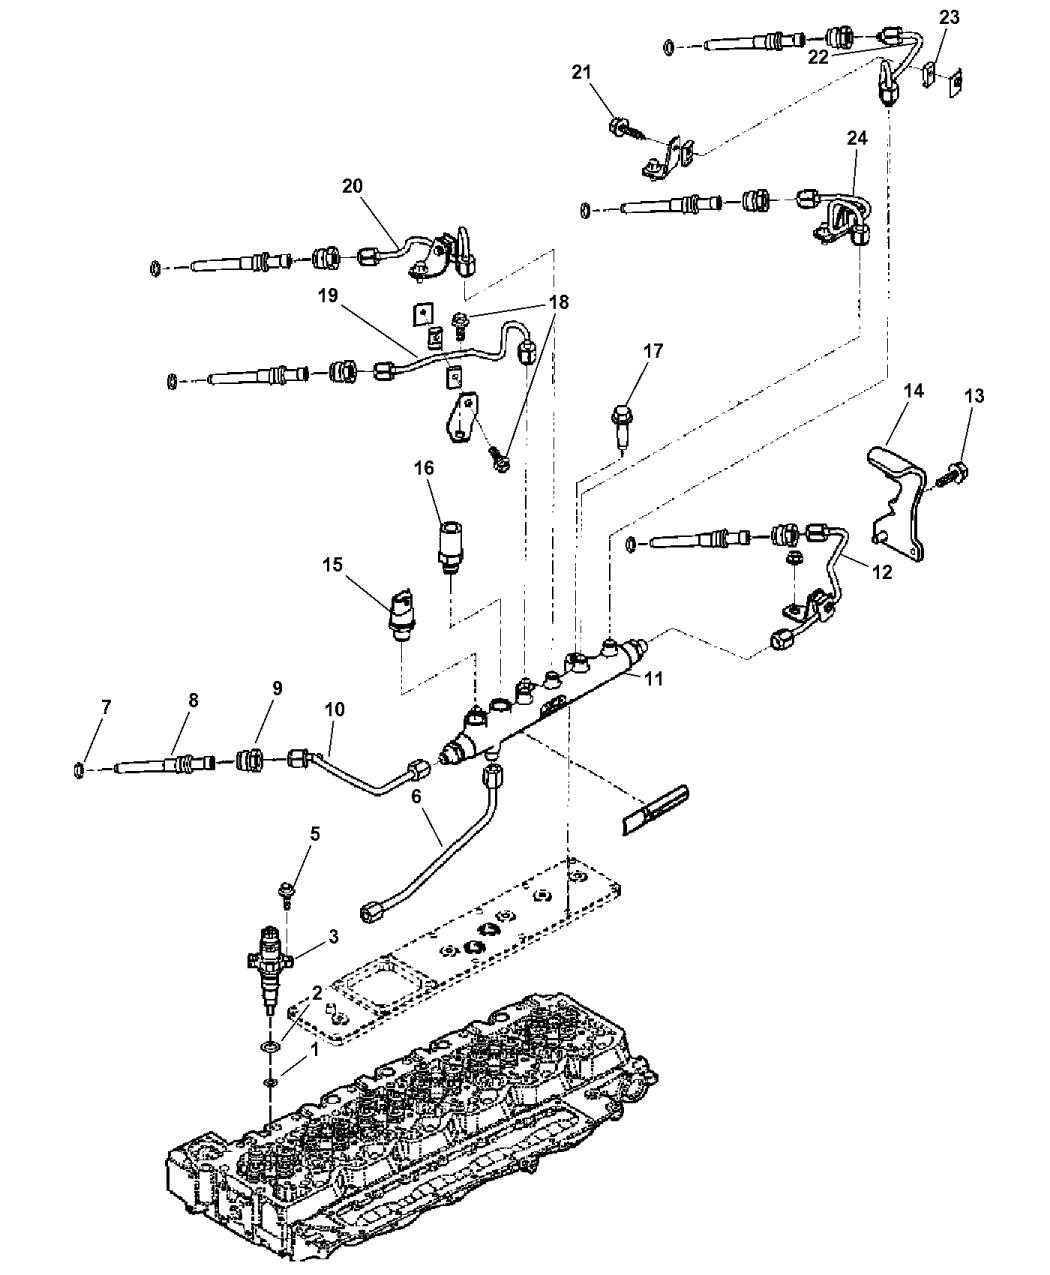 General Fuel Pressure Diagram : Aa genuine mopar sensor fuel pressure